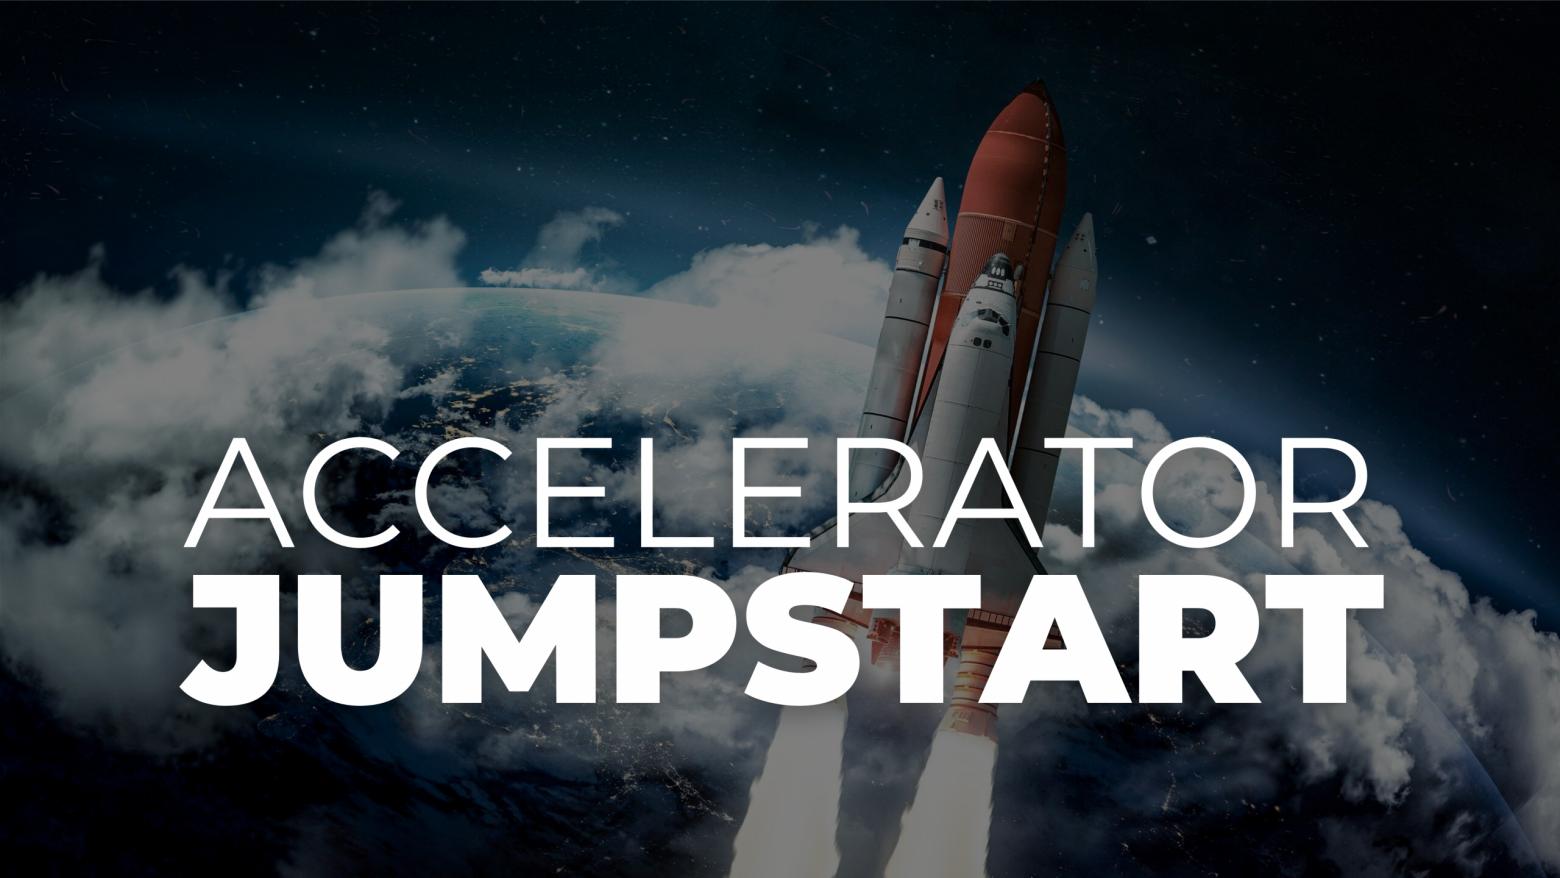 Accelerator Jumpstart 7 Day Accelerator Course